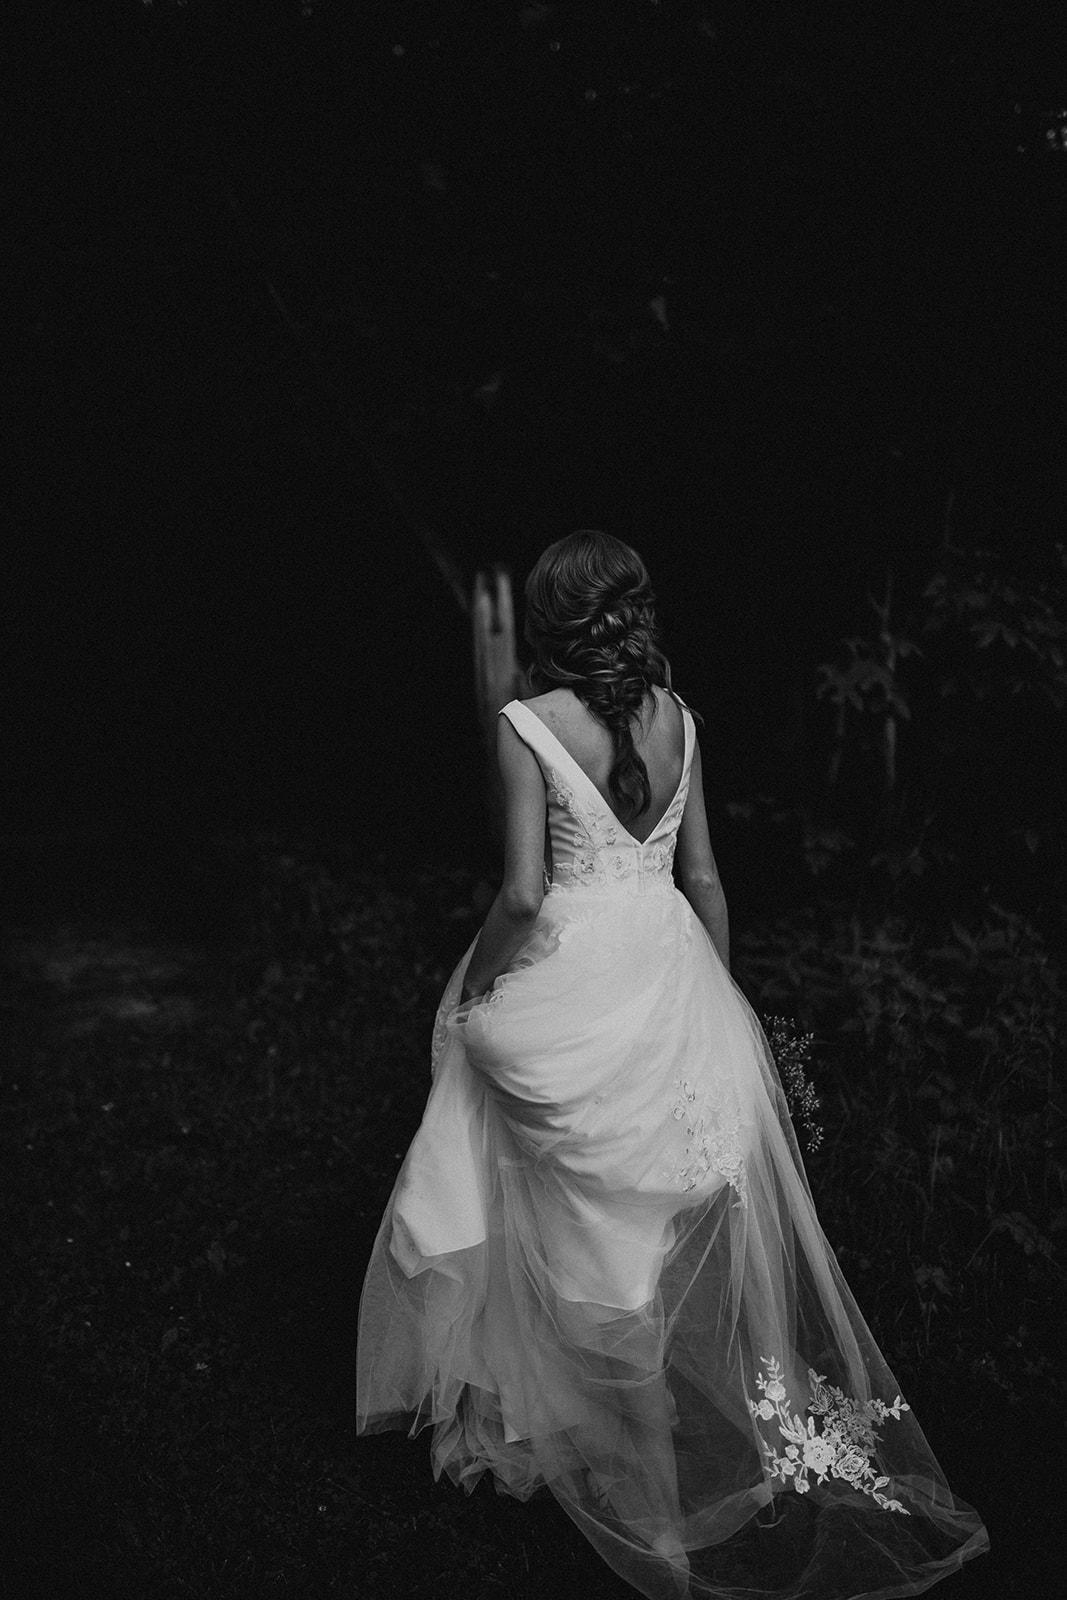 camp_wokanda_peoria_illinois_wedding_photographer_wright_photographs_bliese_0729.jpg